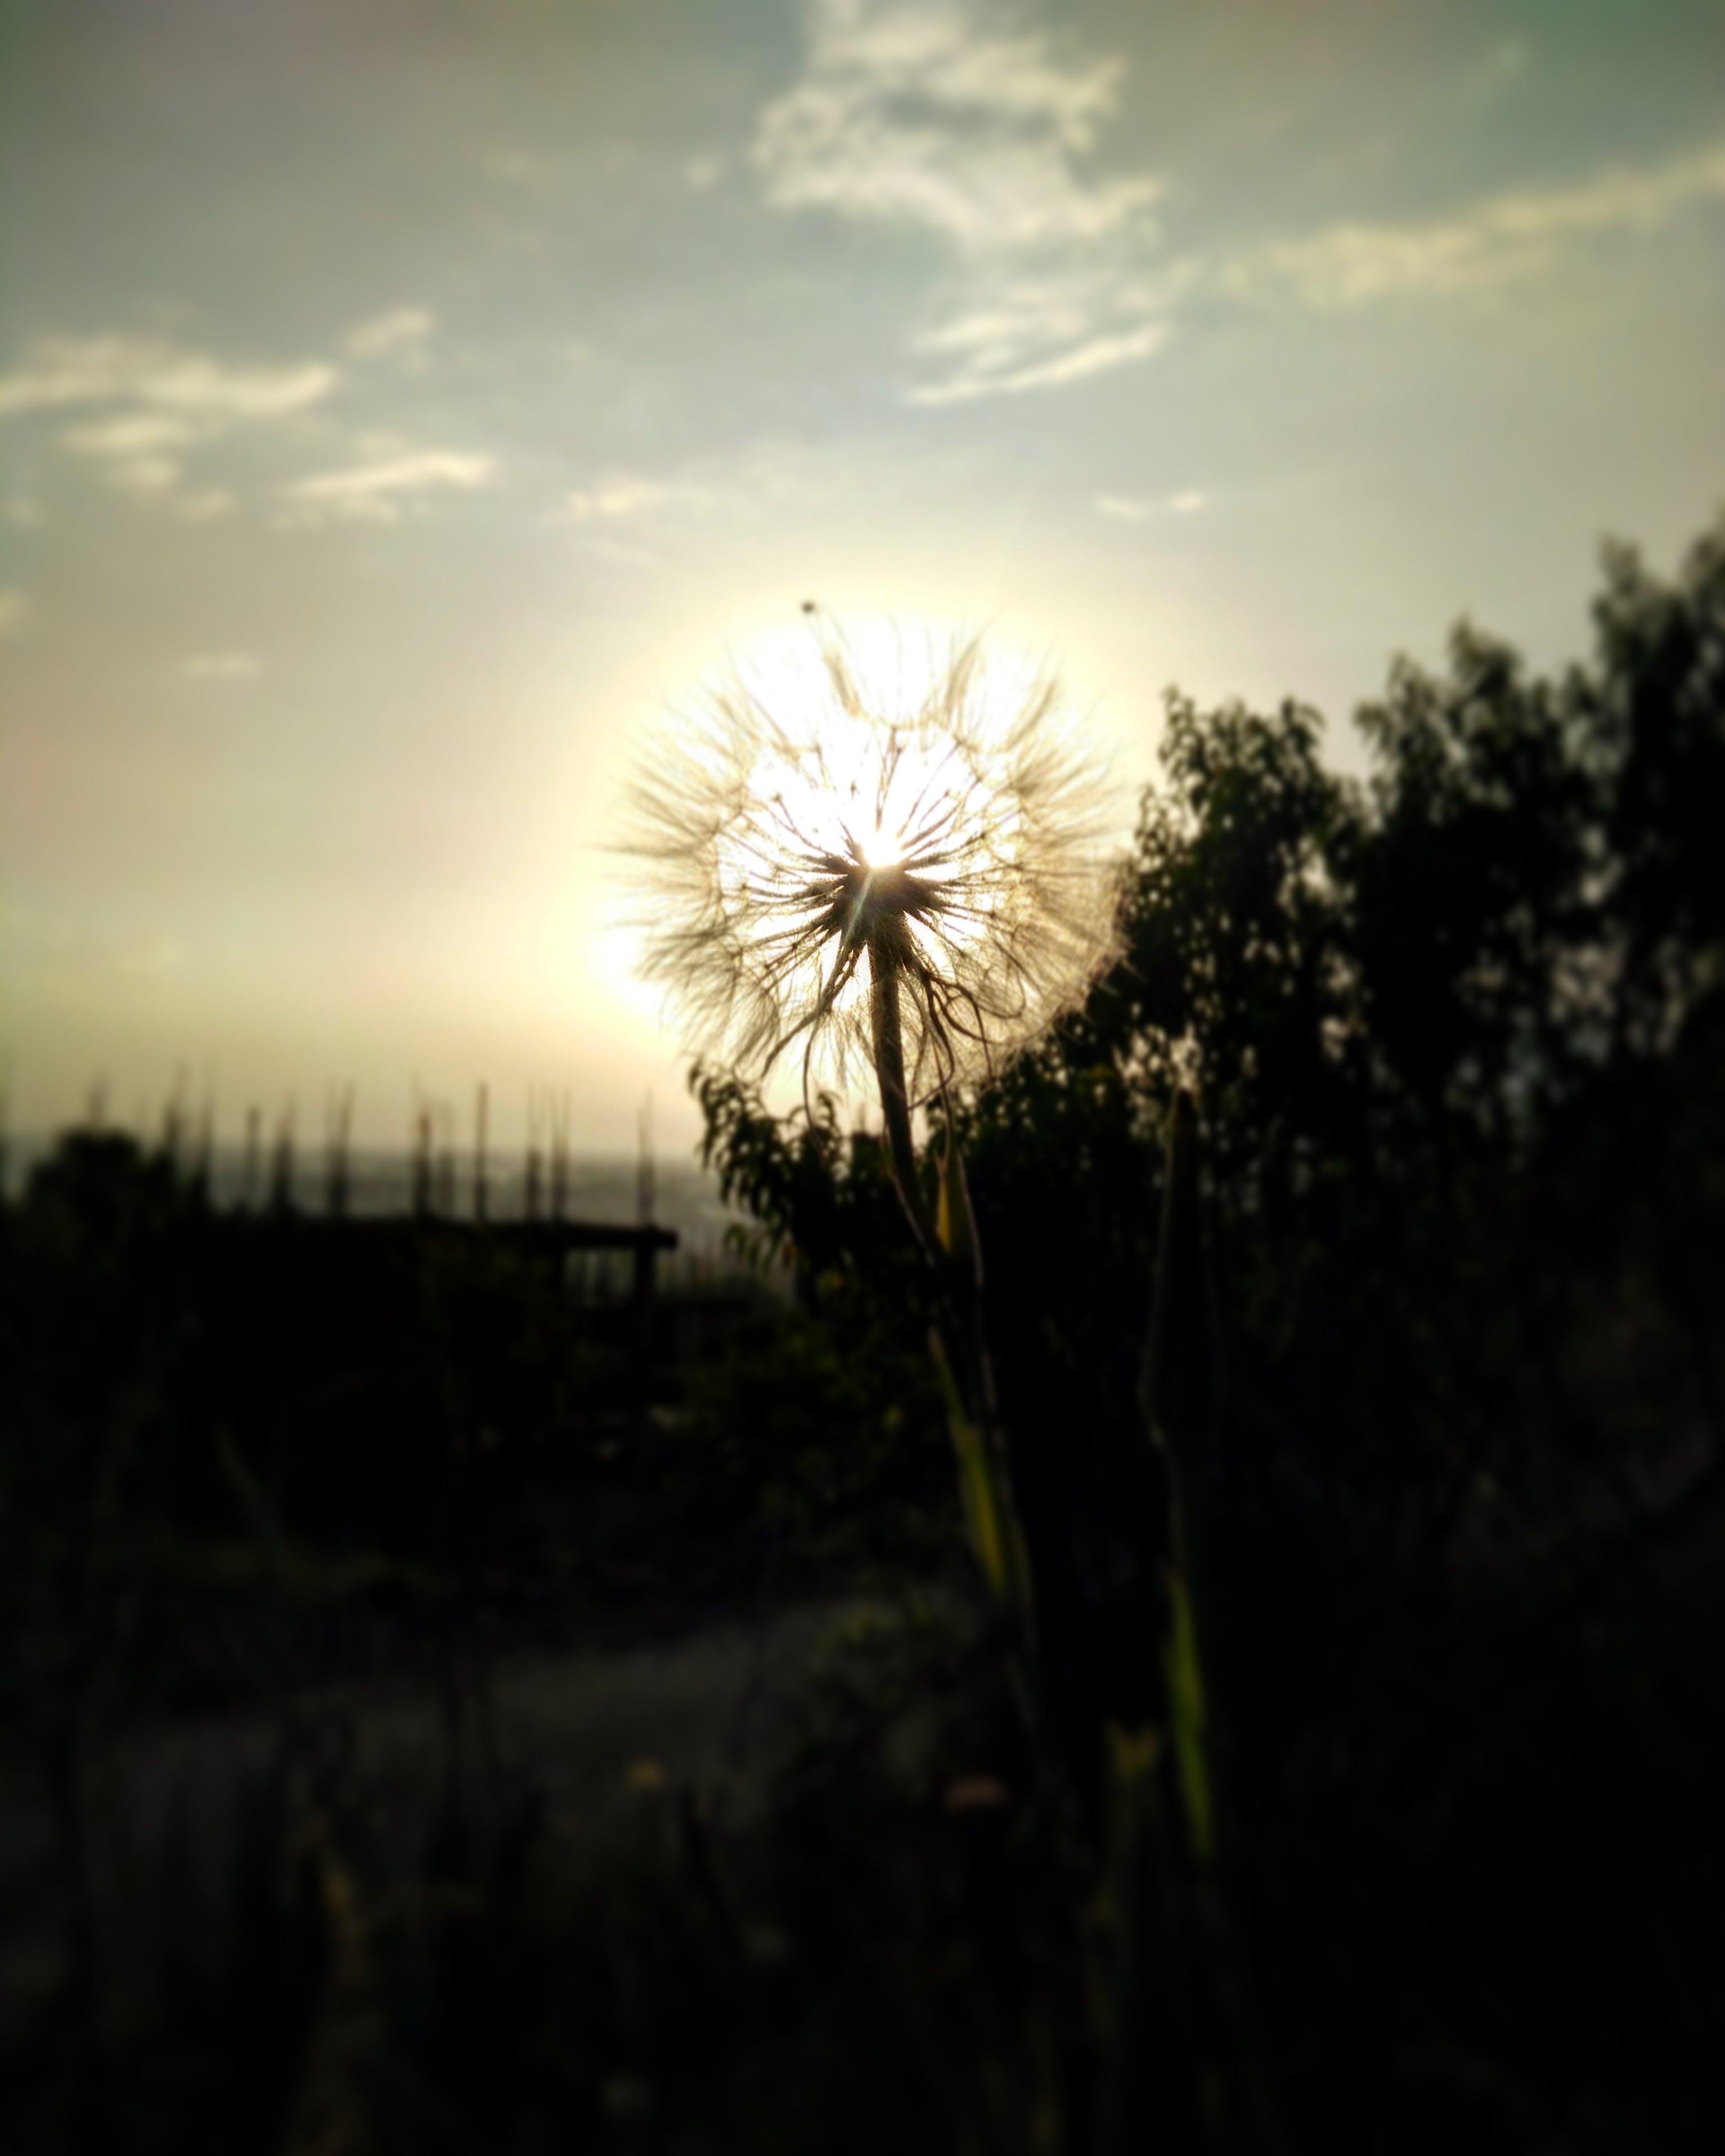 Free stock photo of silhouette, flower, outdoors, macro